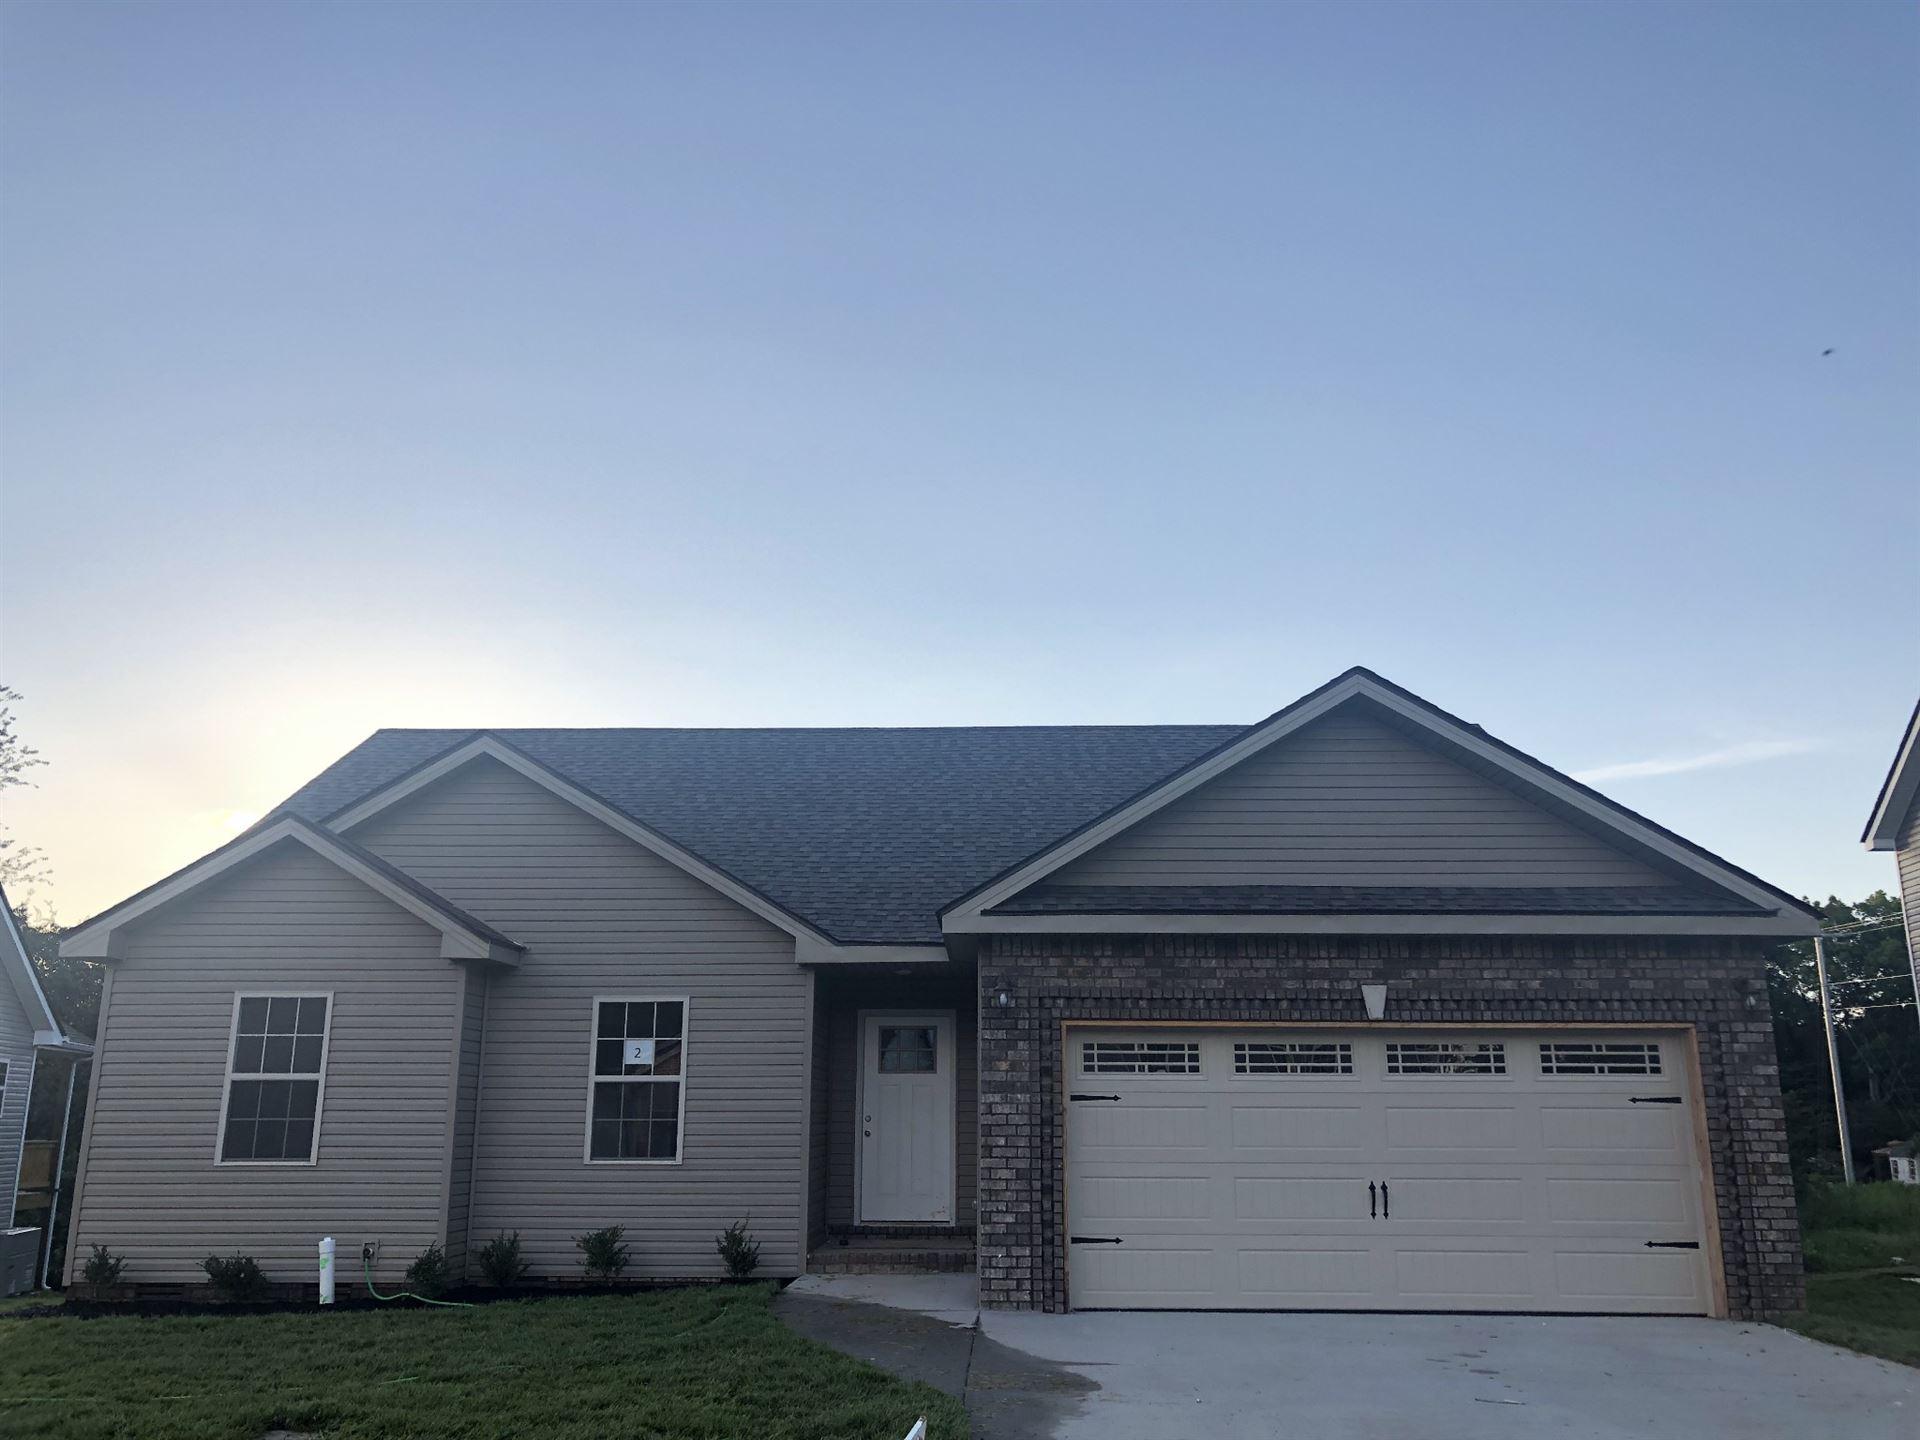 2 Irish Hills, Clarksville, TN 37042 - MLS#: 2264622